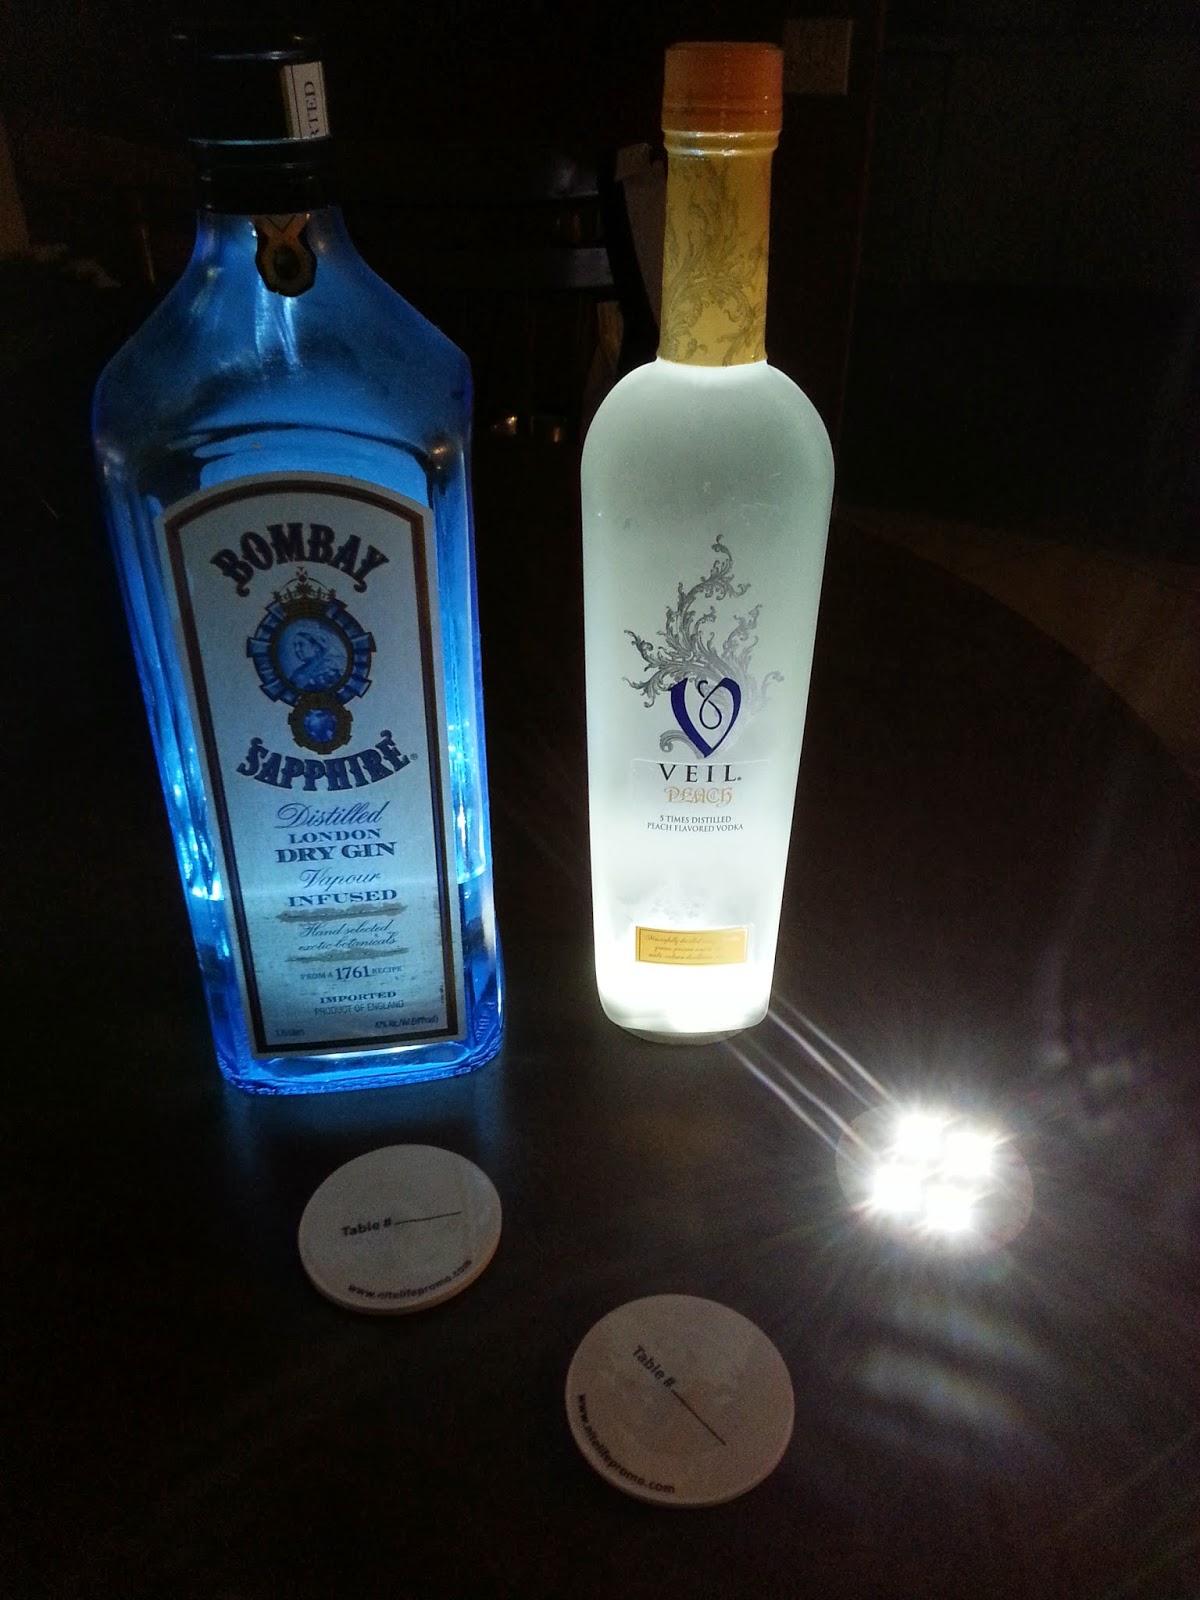 led bottle glow glorifier stick on led bottle coaster lights up belvedere ciroc grey goose bottles to glow